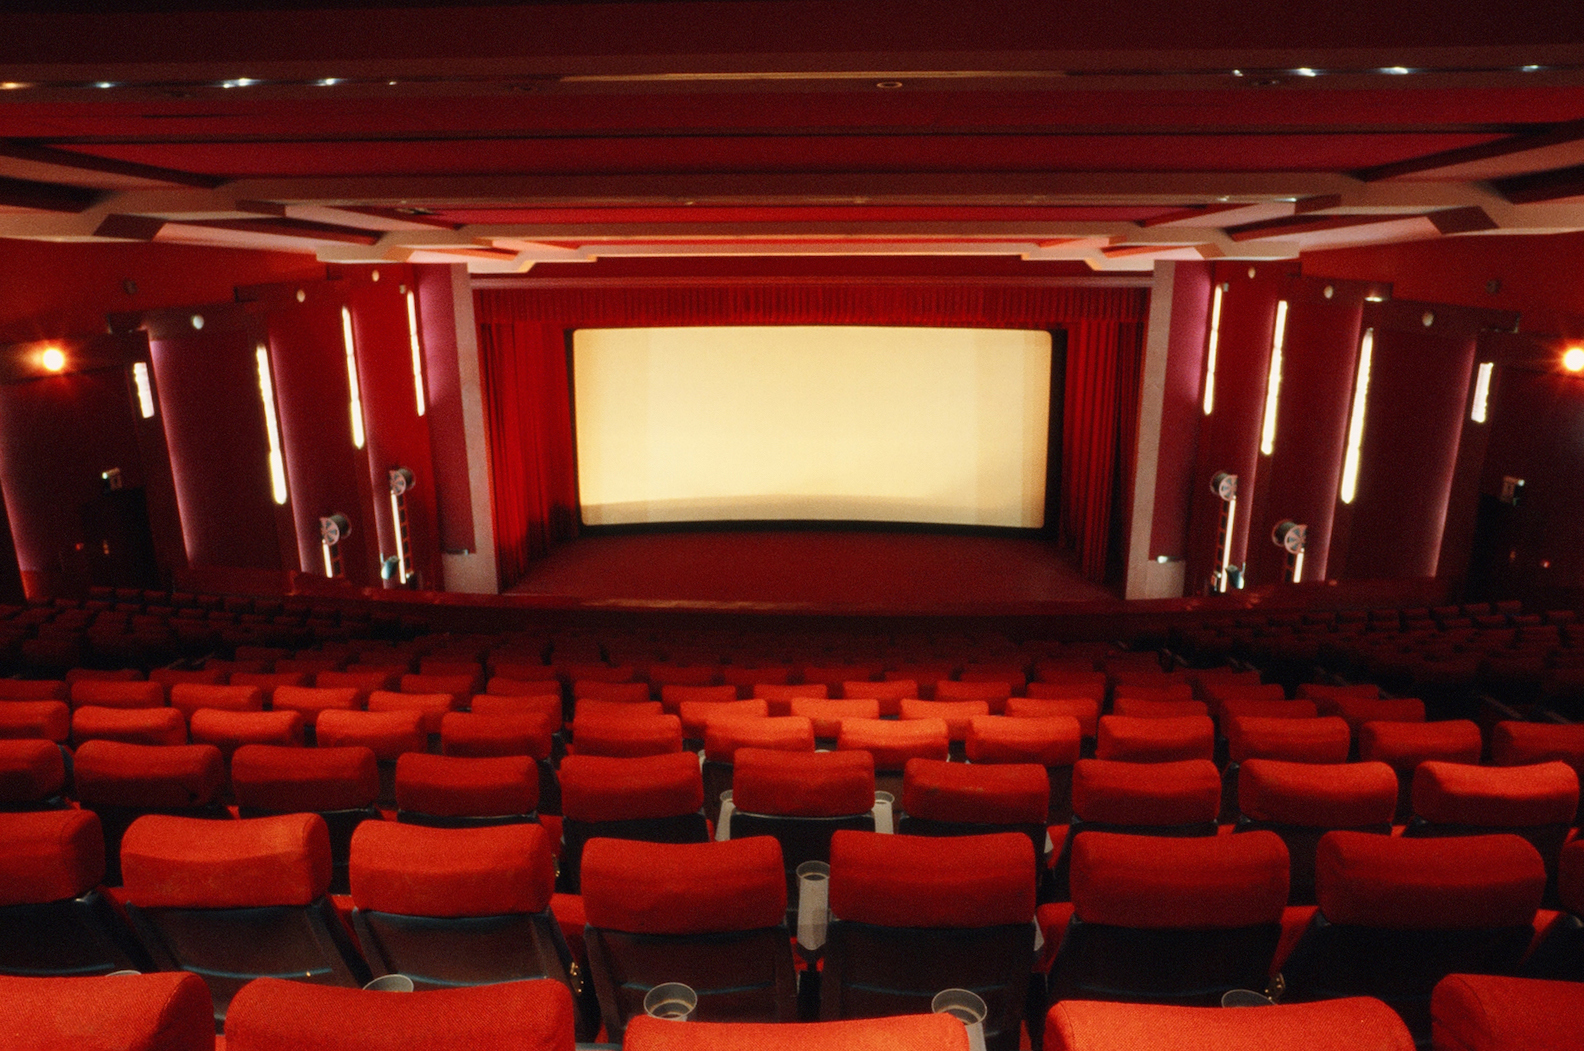 kerning-cultures-golden-cinema-11.jpg